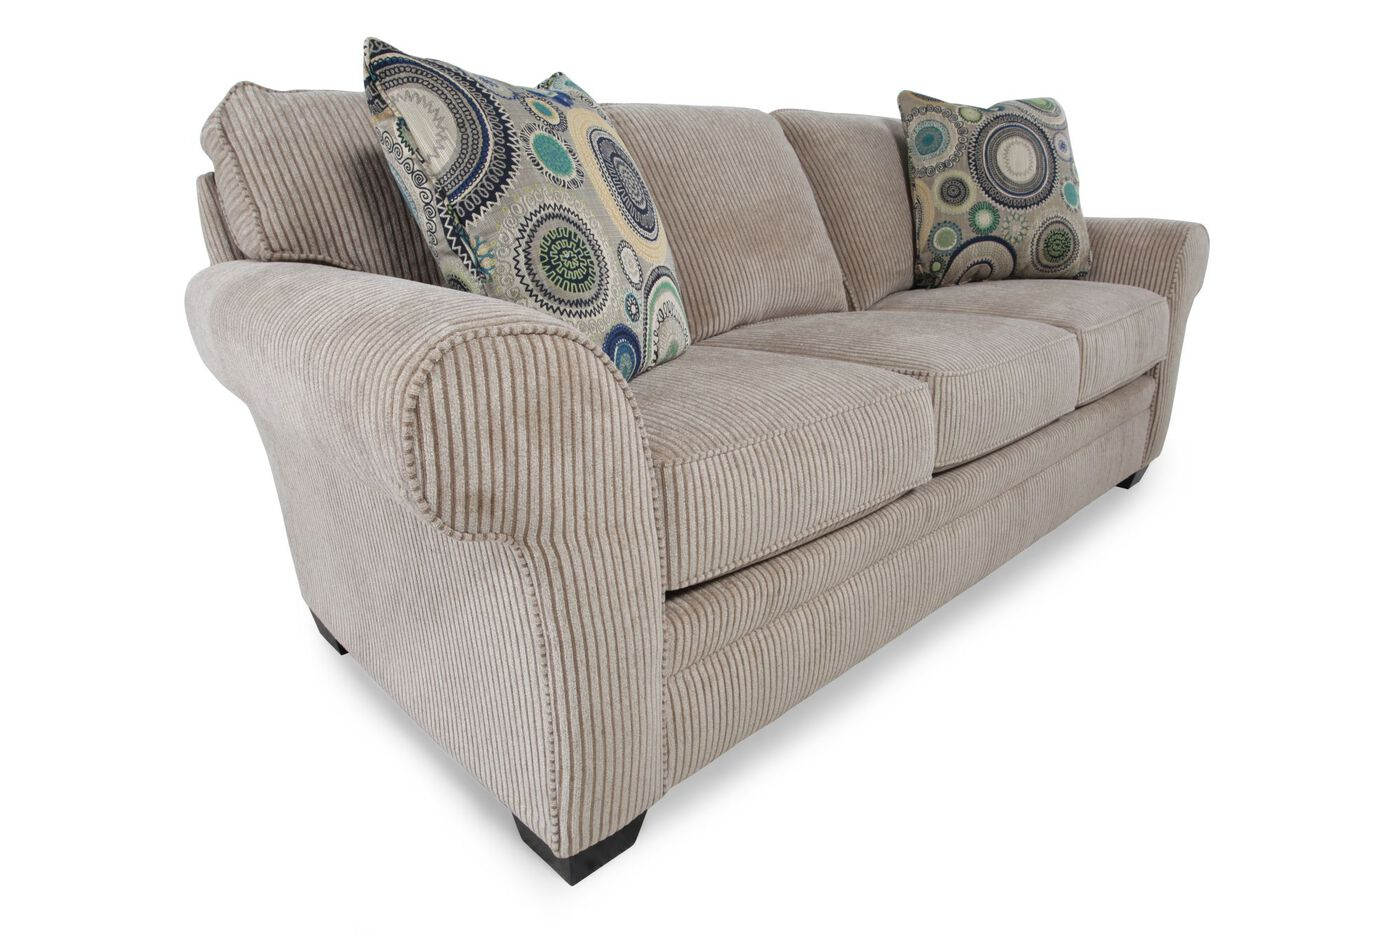 Broyhill Zachary Brown Sofa Mathis Brothers Furniture - Broyhill zachary sofa